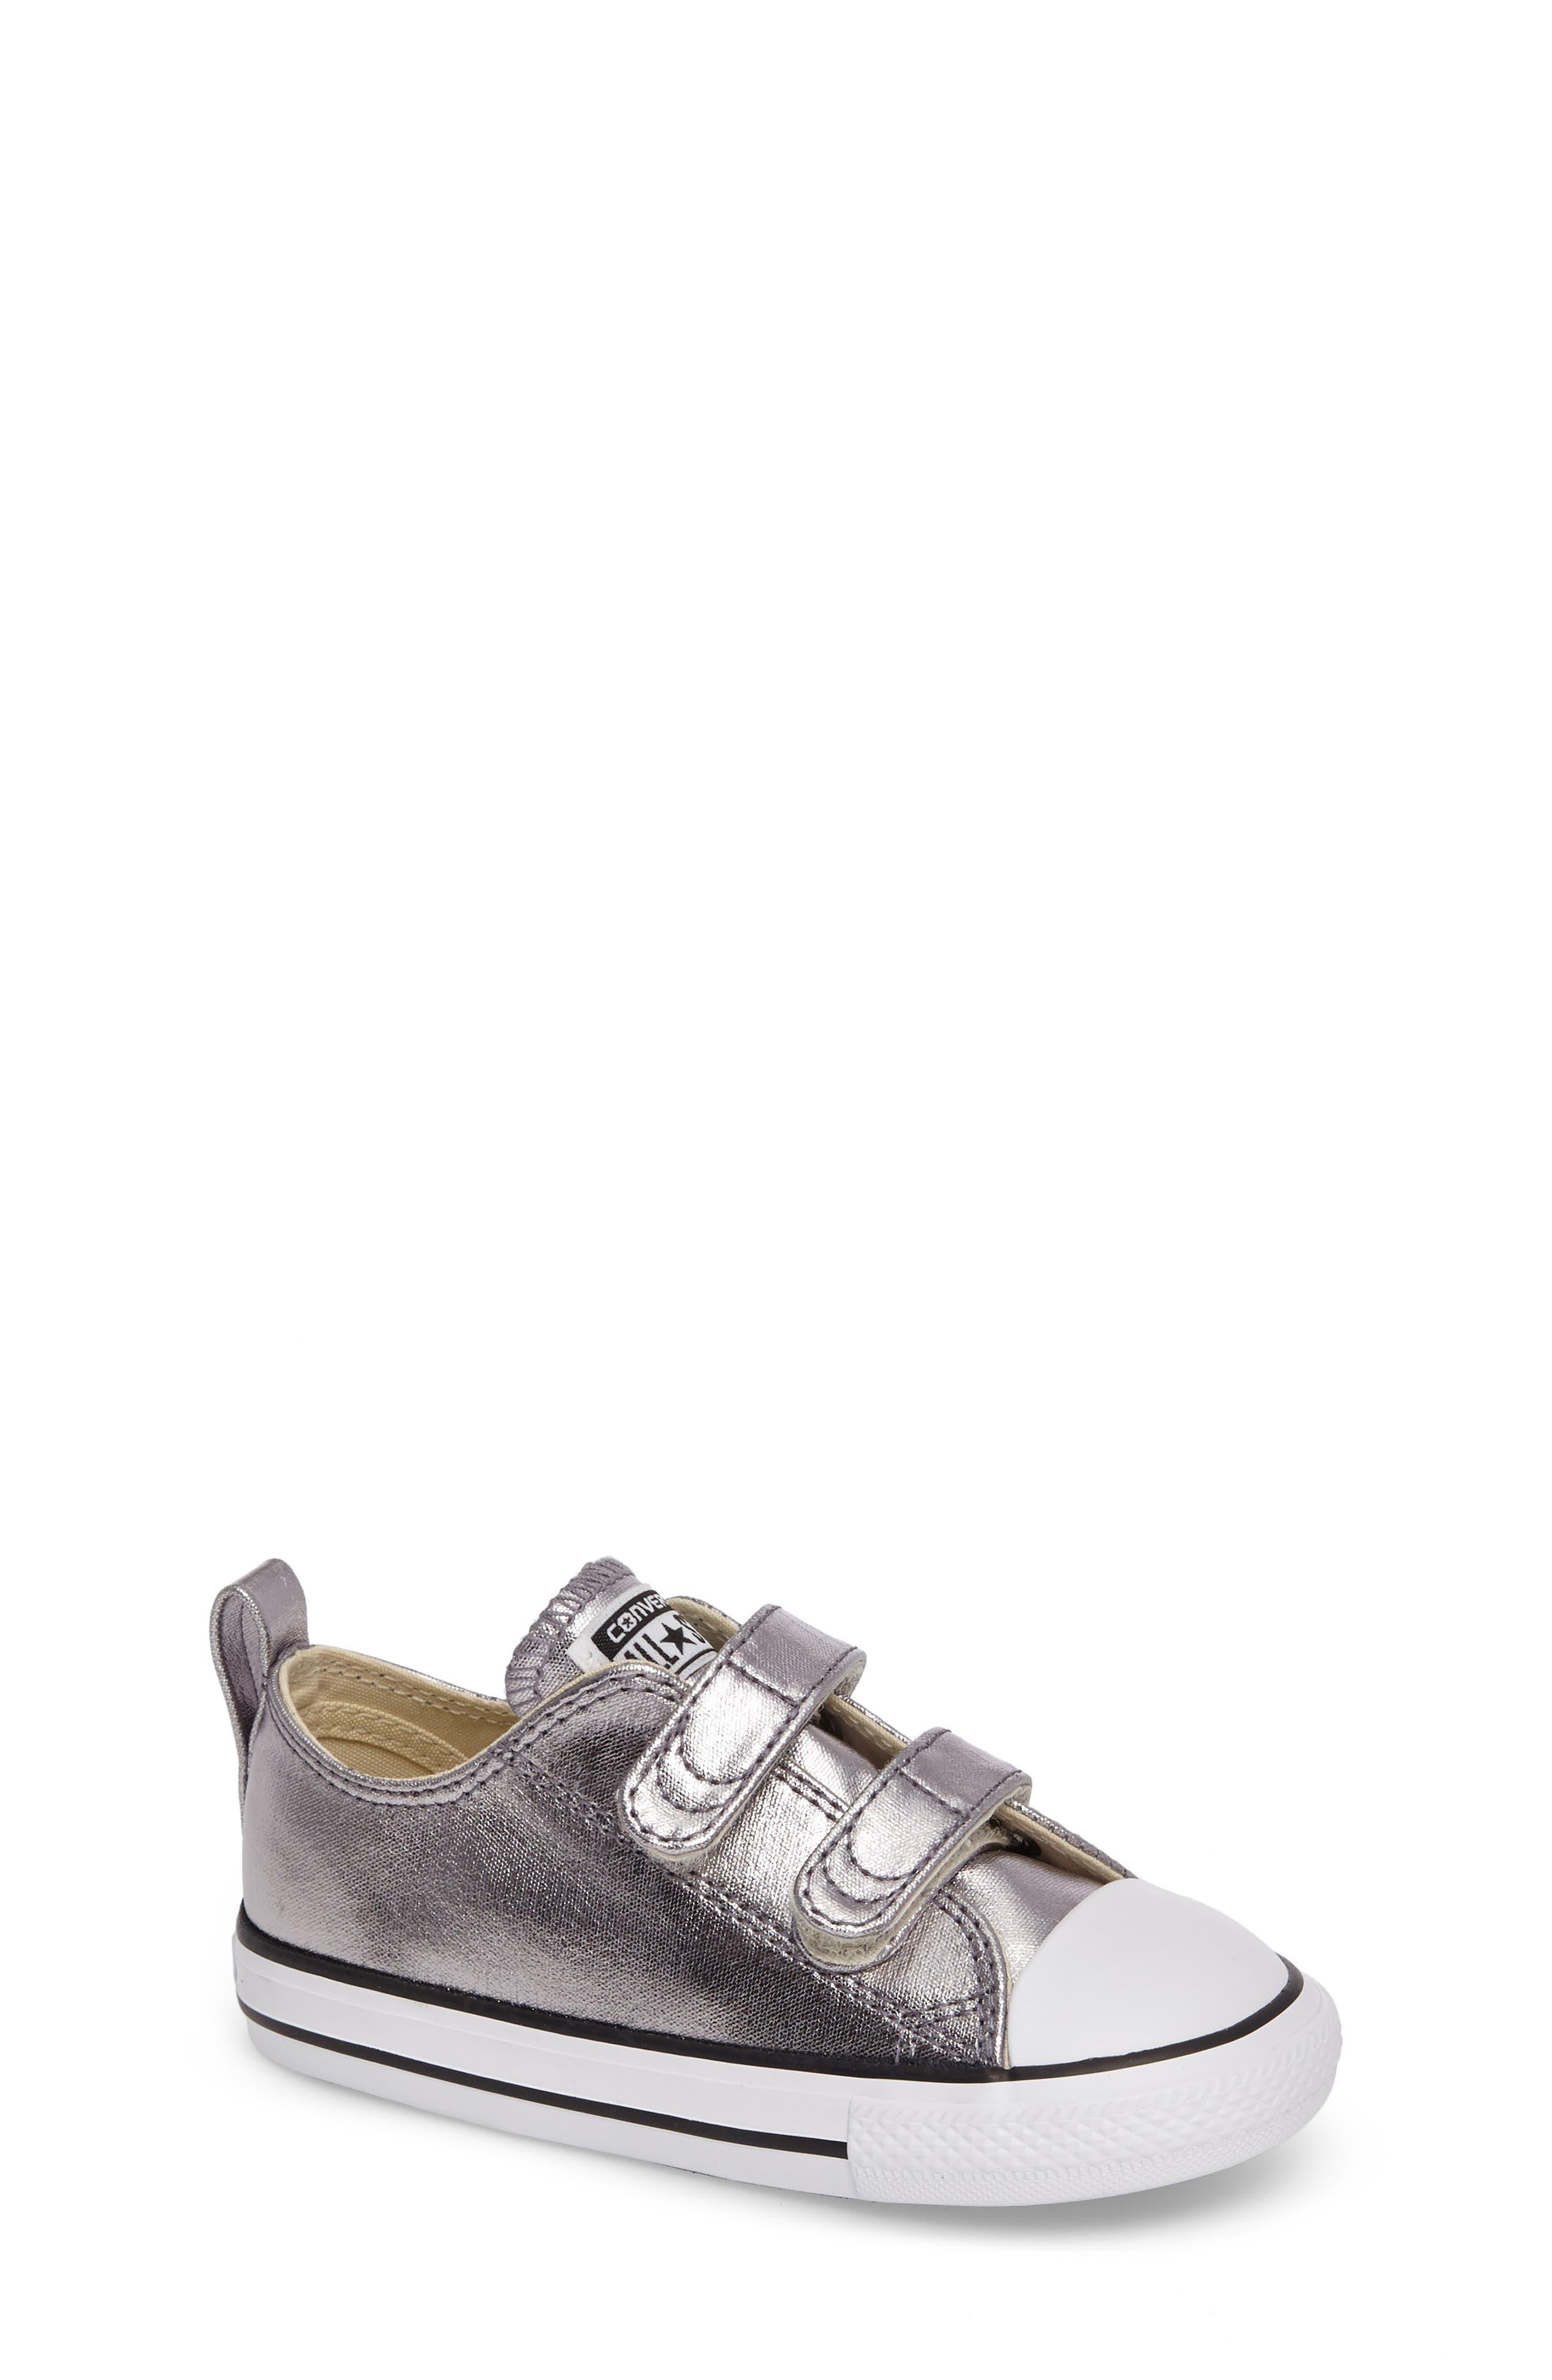 Converse Chuck Taylor® All Star® Seasonal Metallic Low Top Sneaker (Baby, Walker & Toddler)